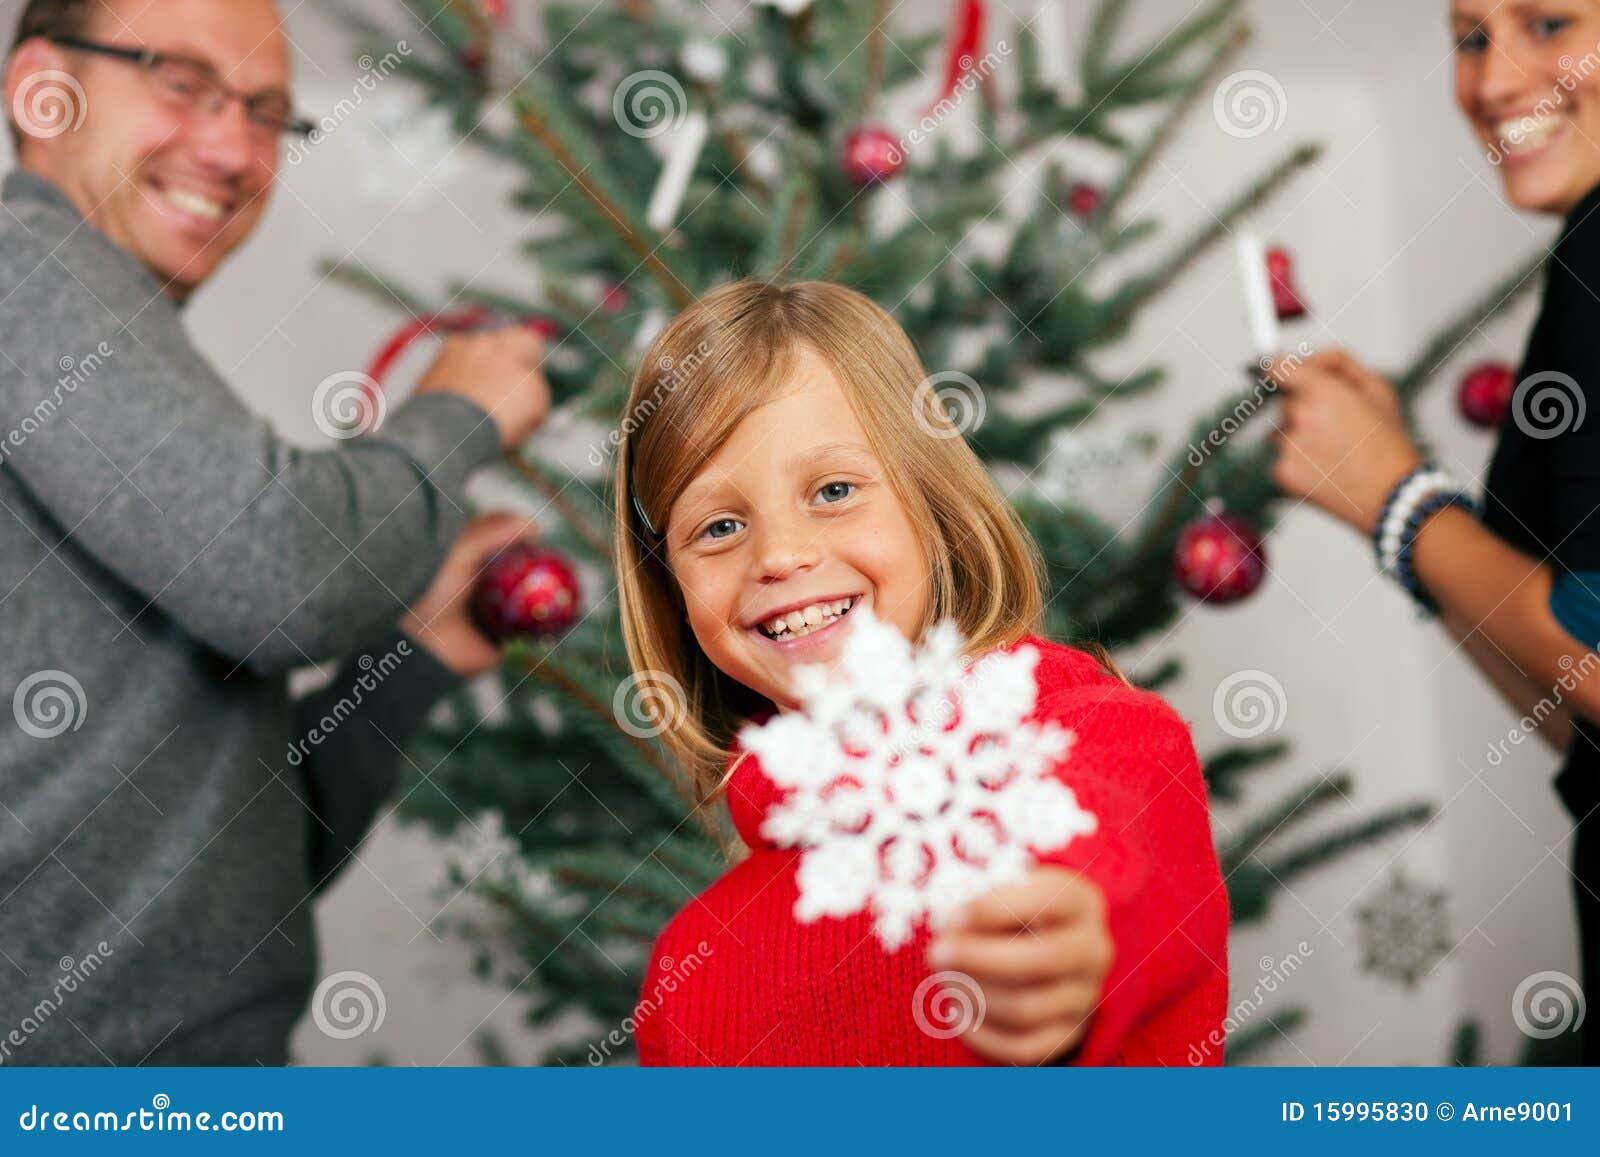 Family Decorating The Christmas Tree Stock Photo Image